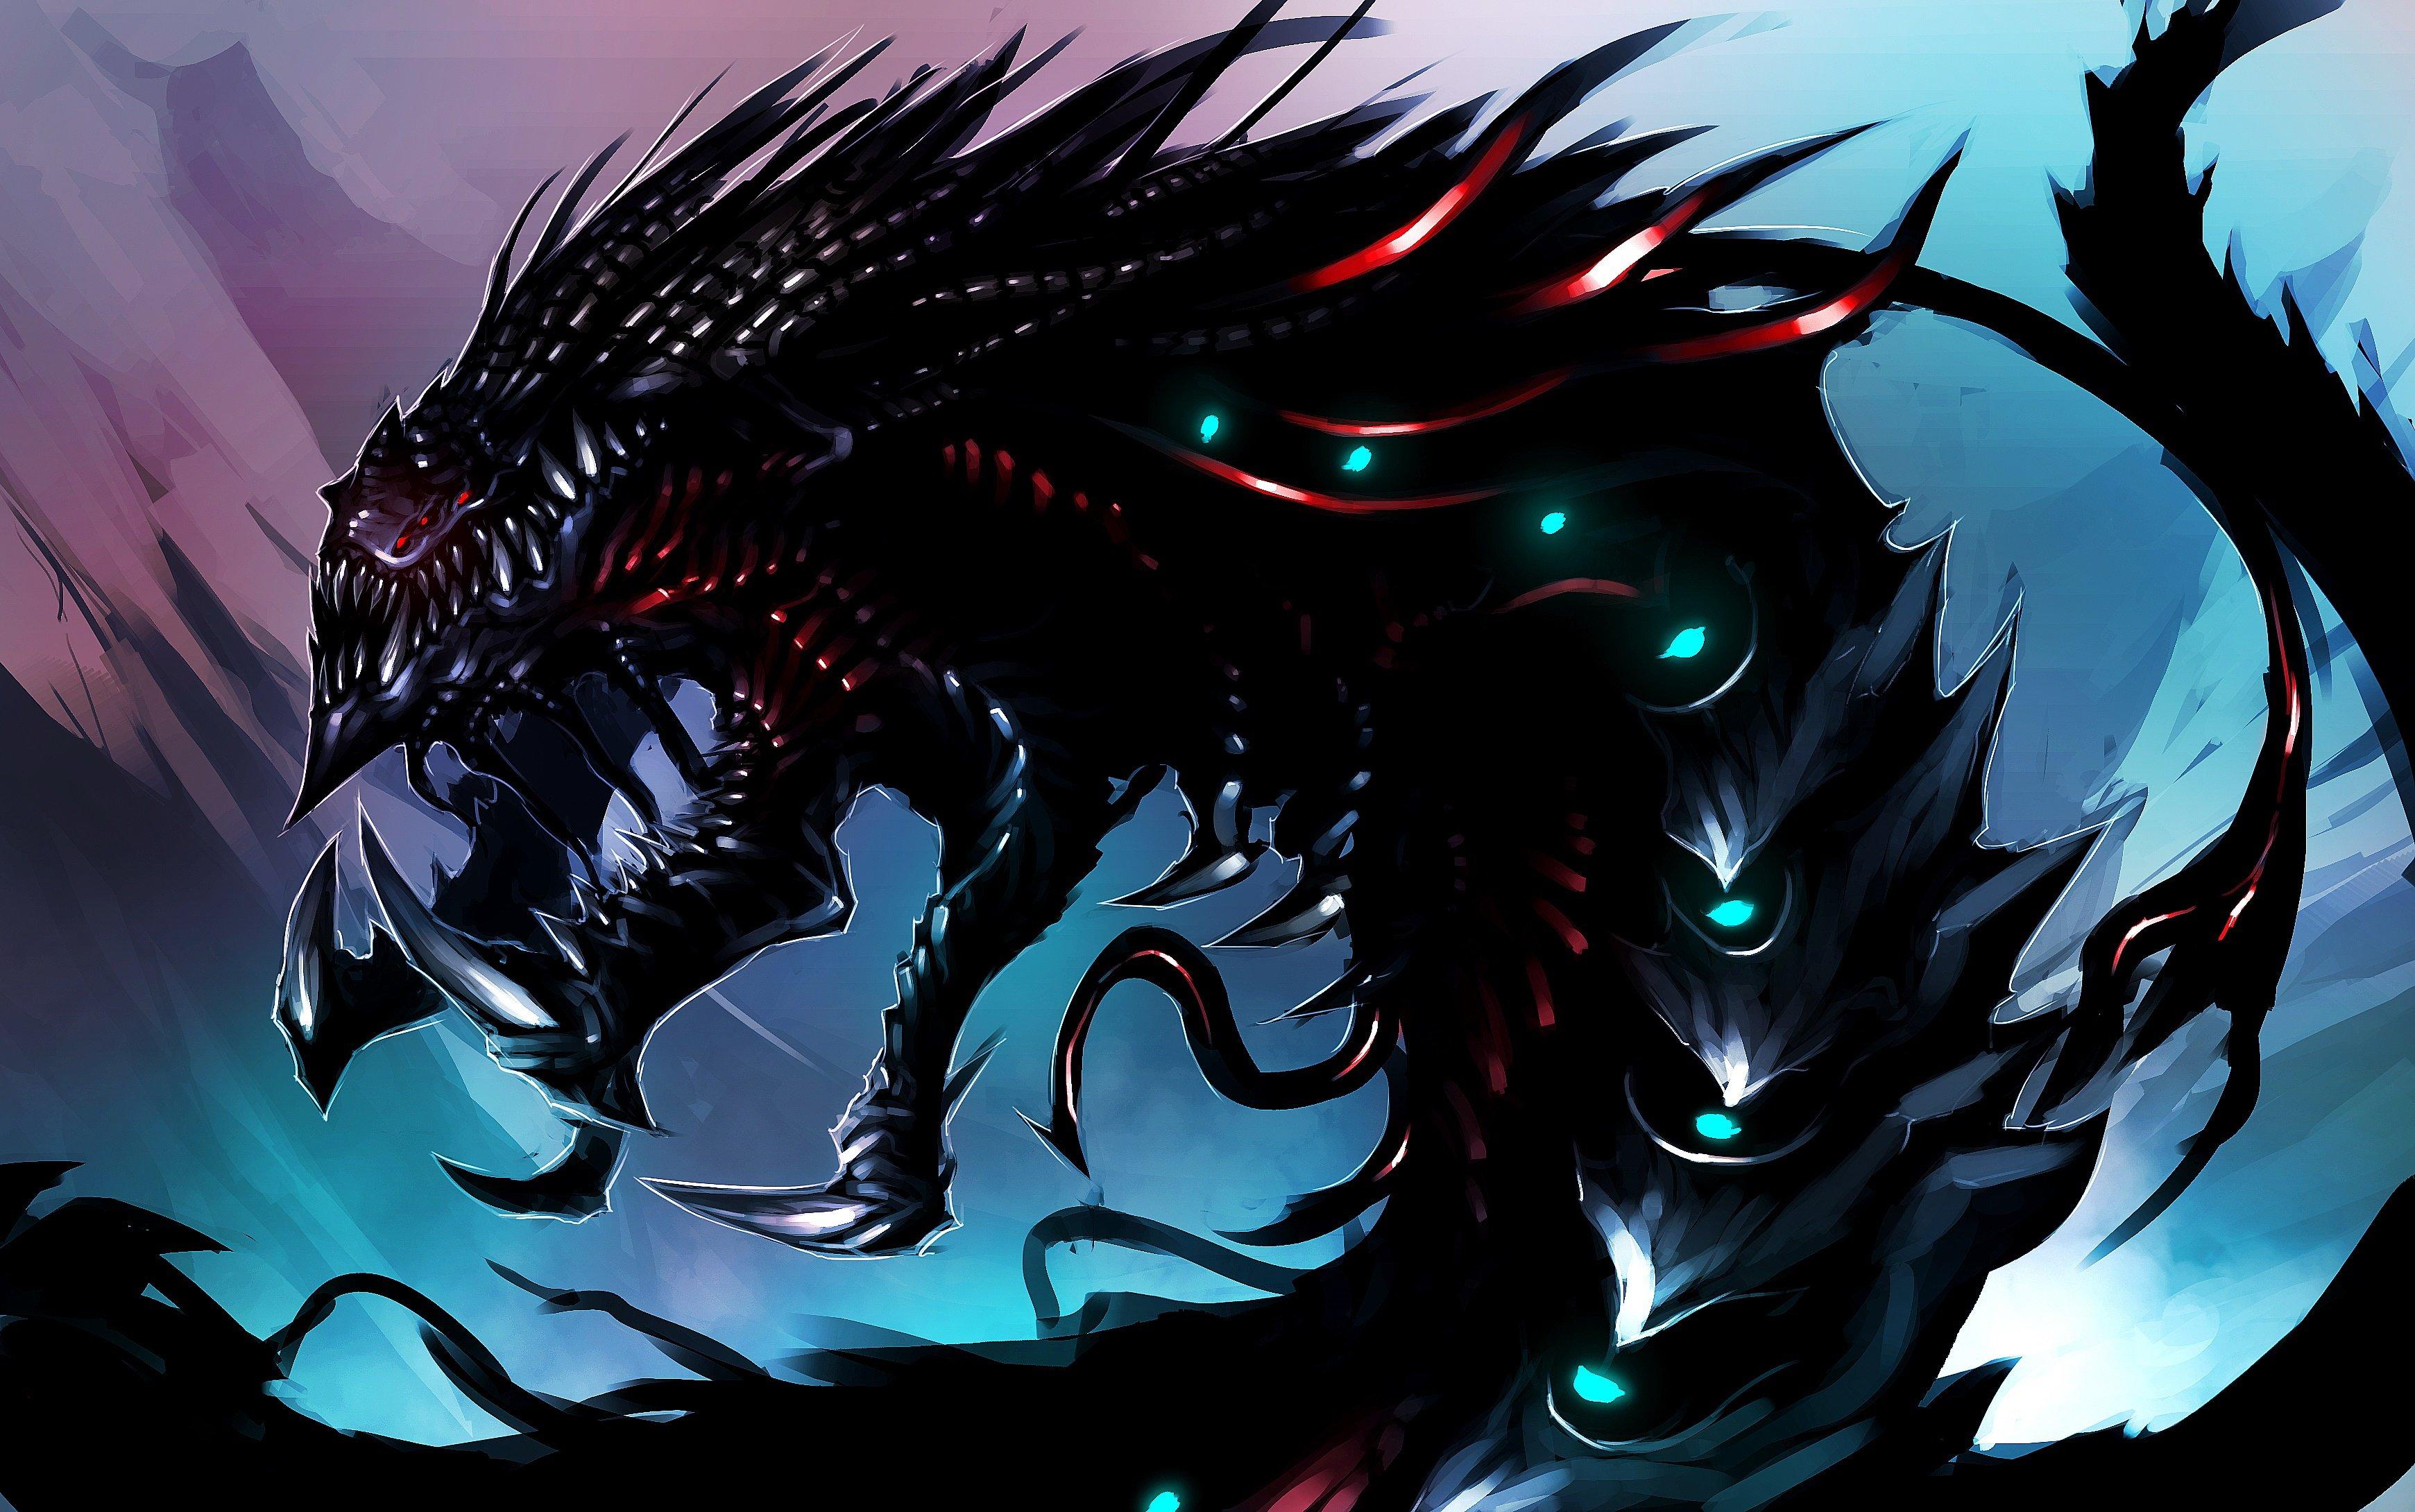 Monster Fantasy Serpent Creature Art Artwork Psychedelic